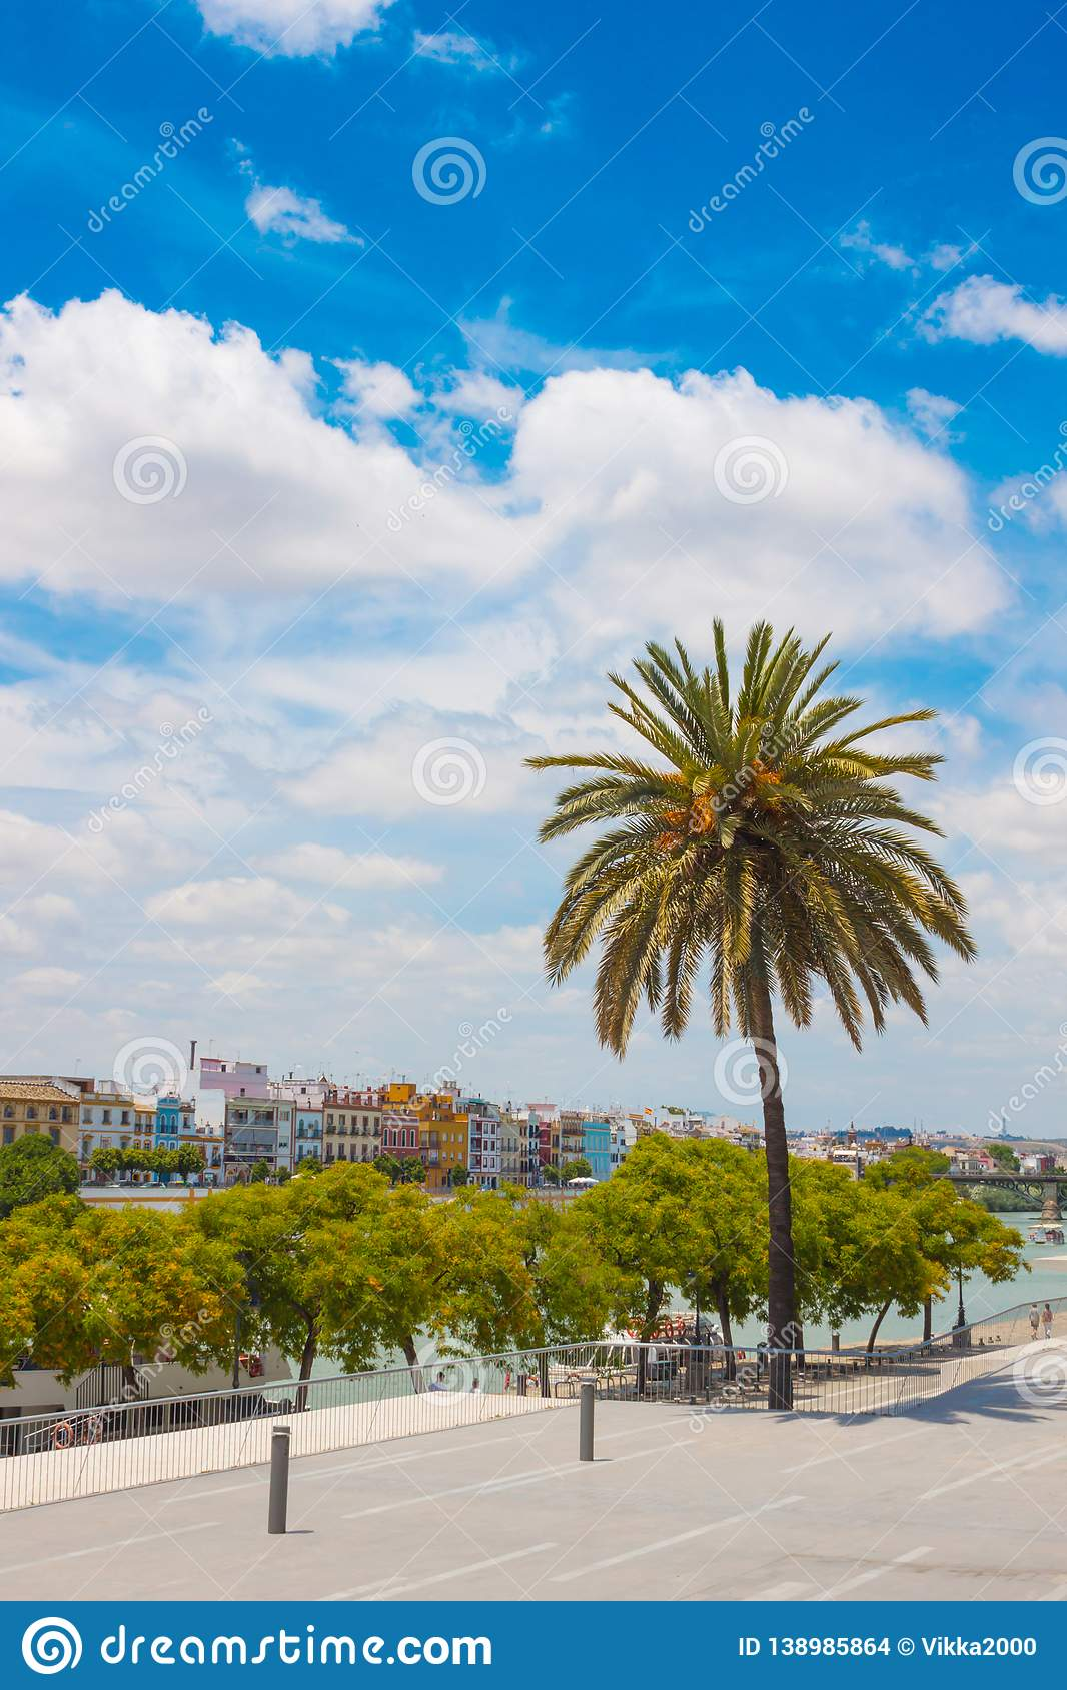 Summer park next to Guadalquivir River, Seville, Spain